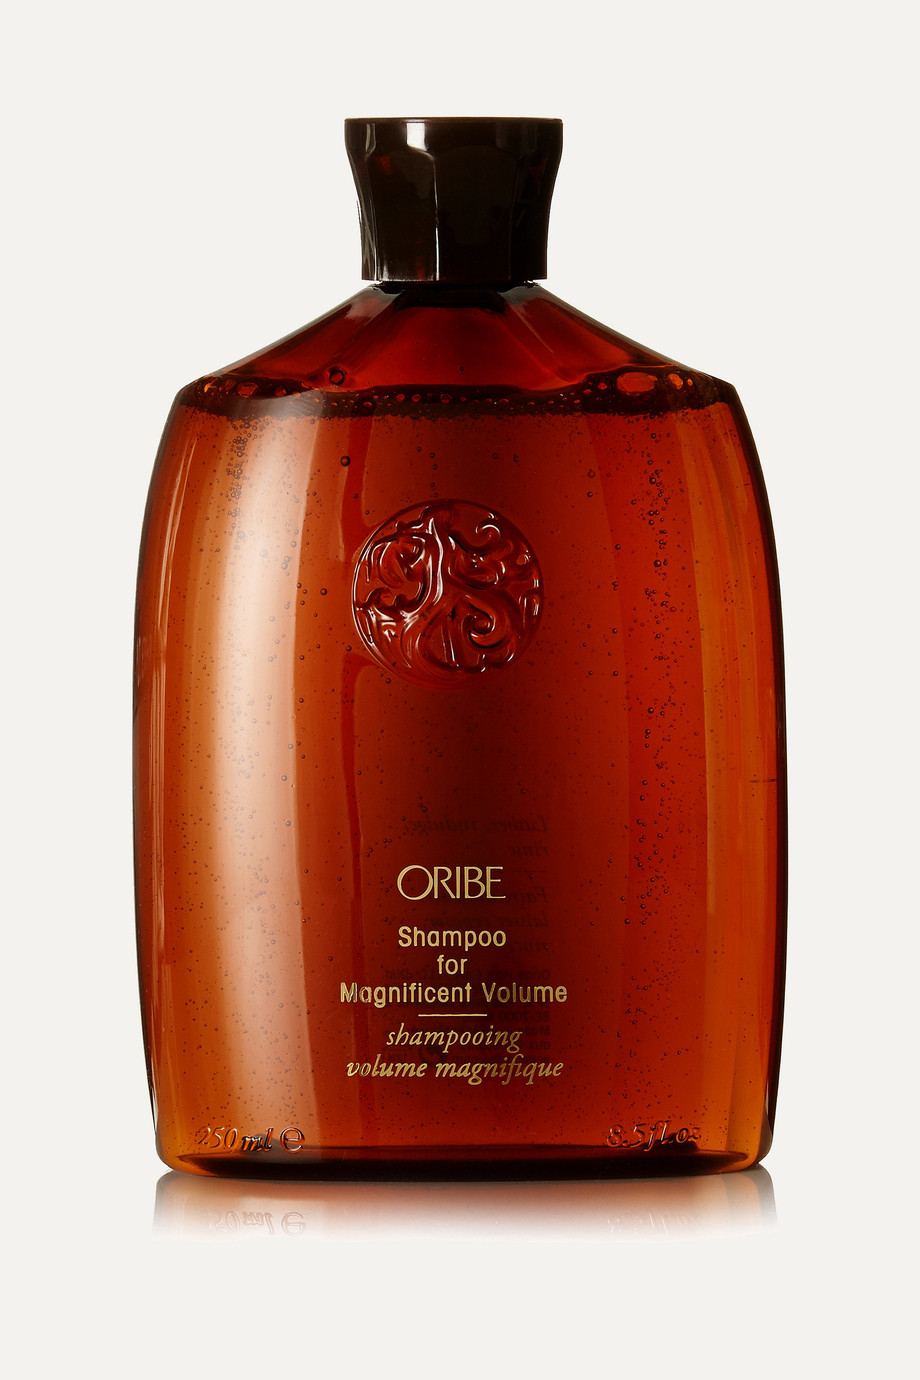 Oribe Shampoo for Magnificent Volume, 250ml